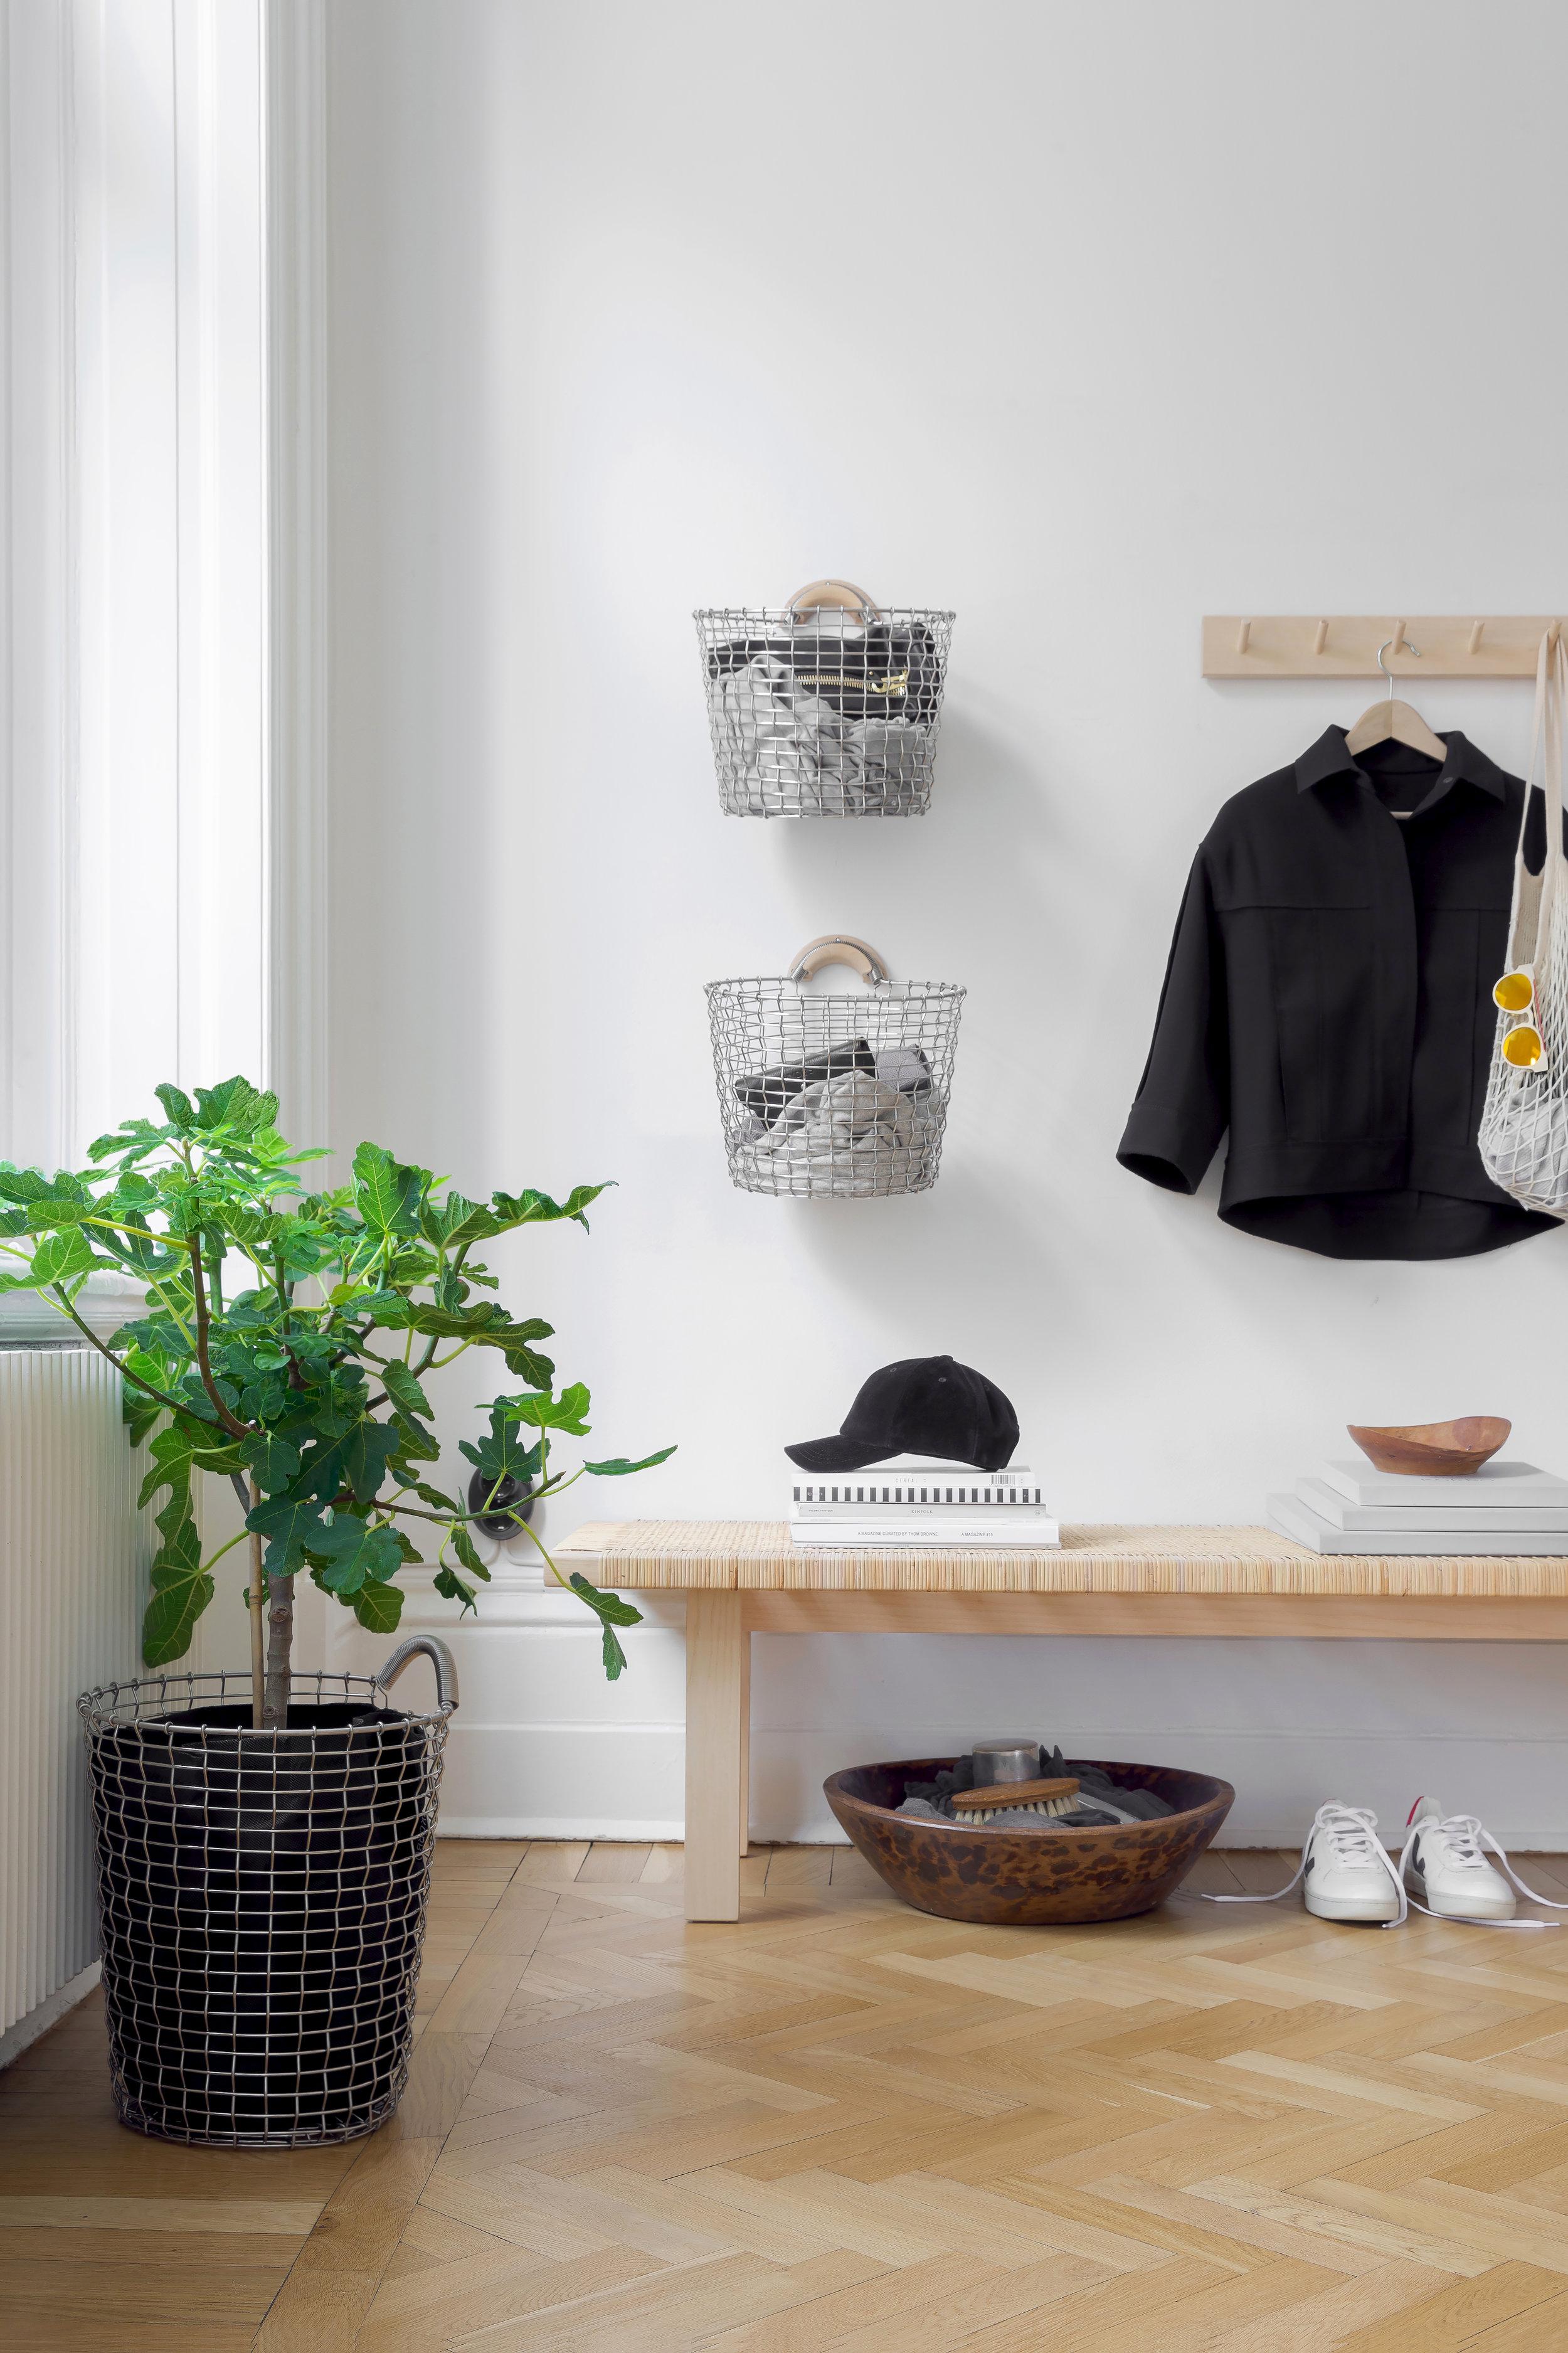 Hallway storage basket: Bin 16 & Bin hanger in Ash wood